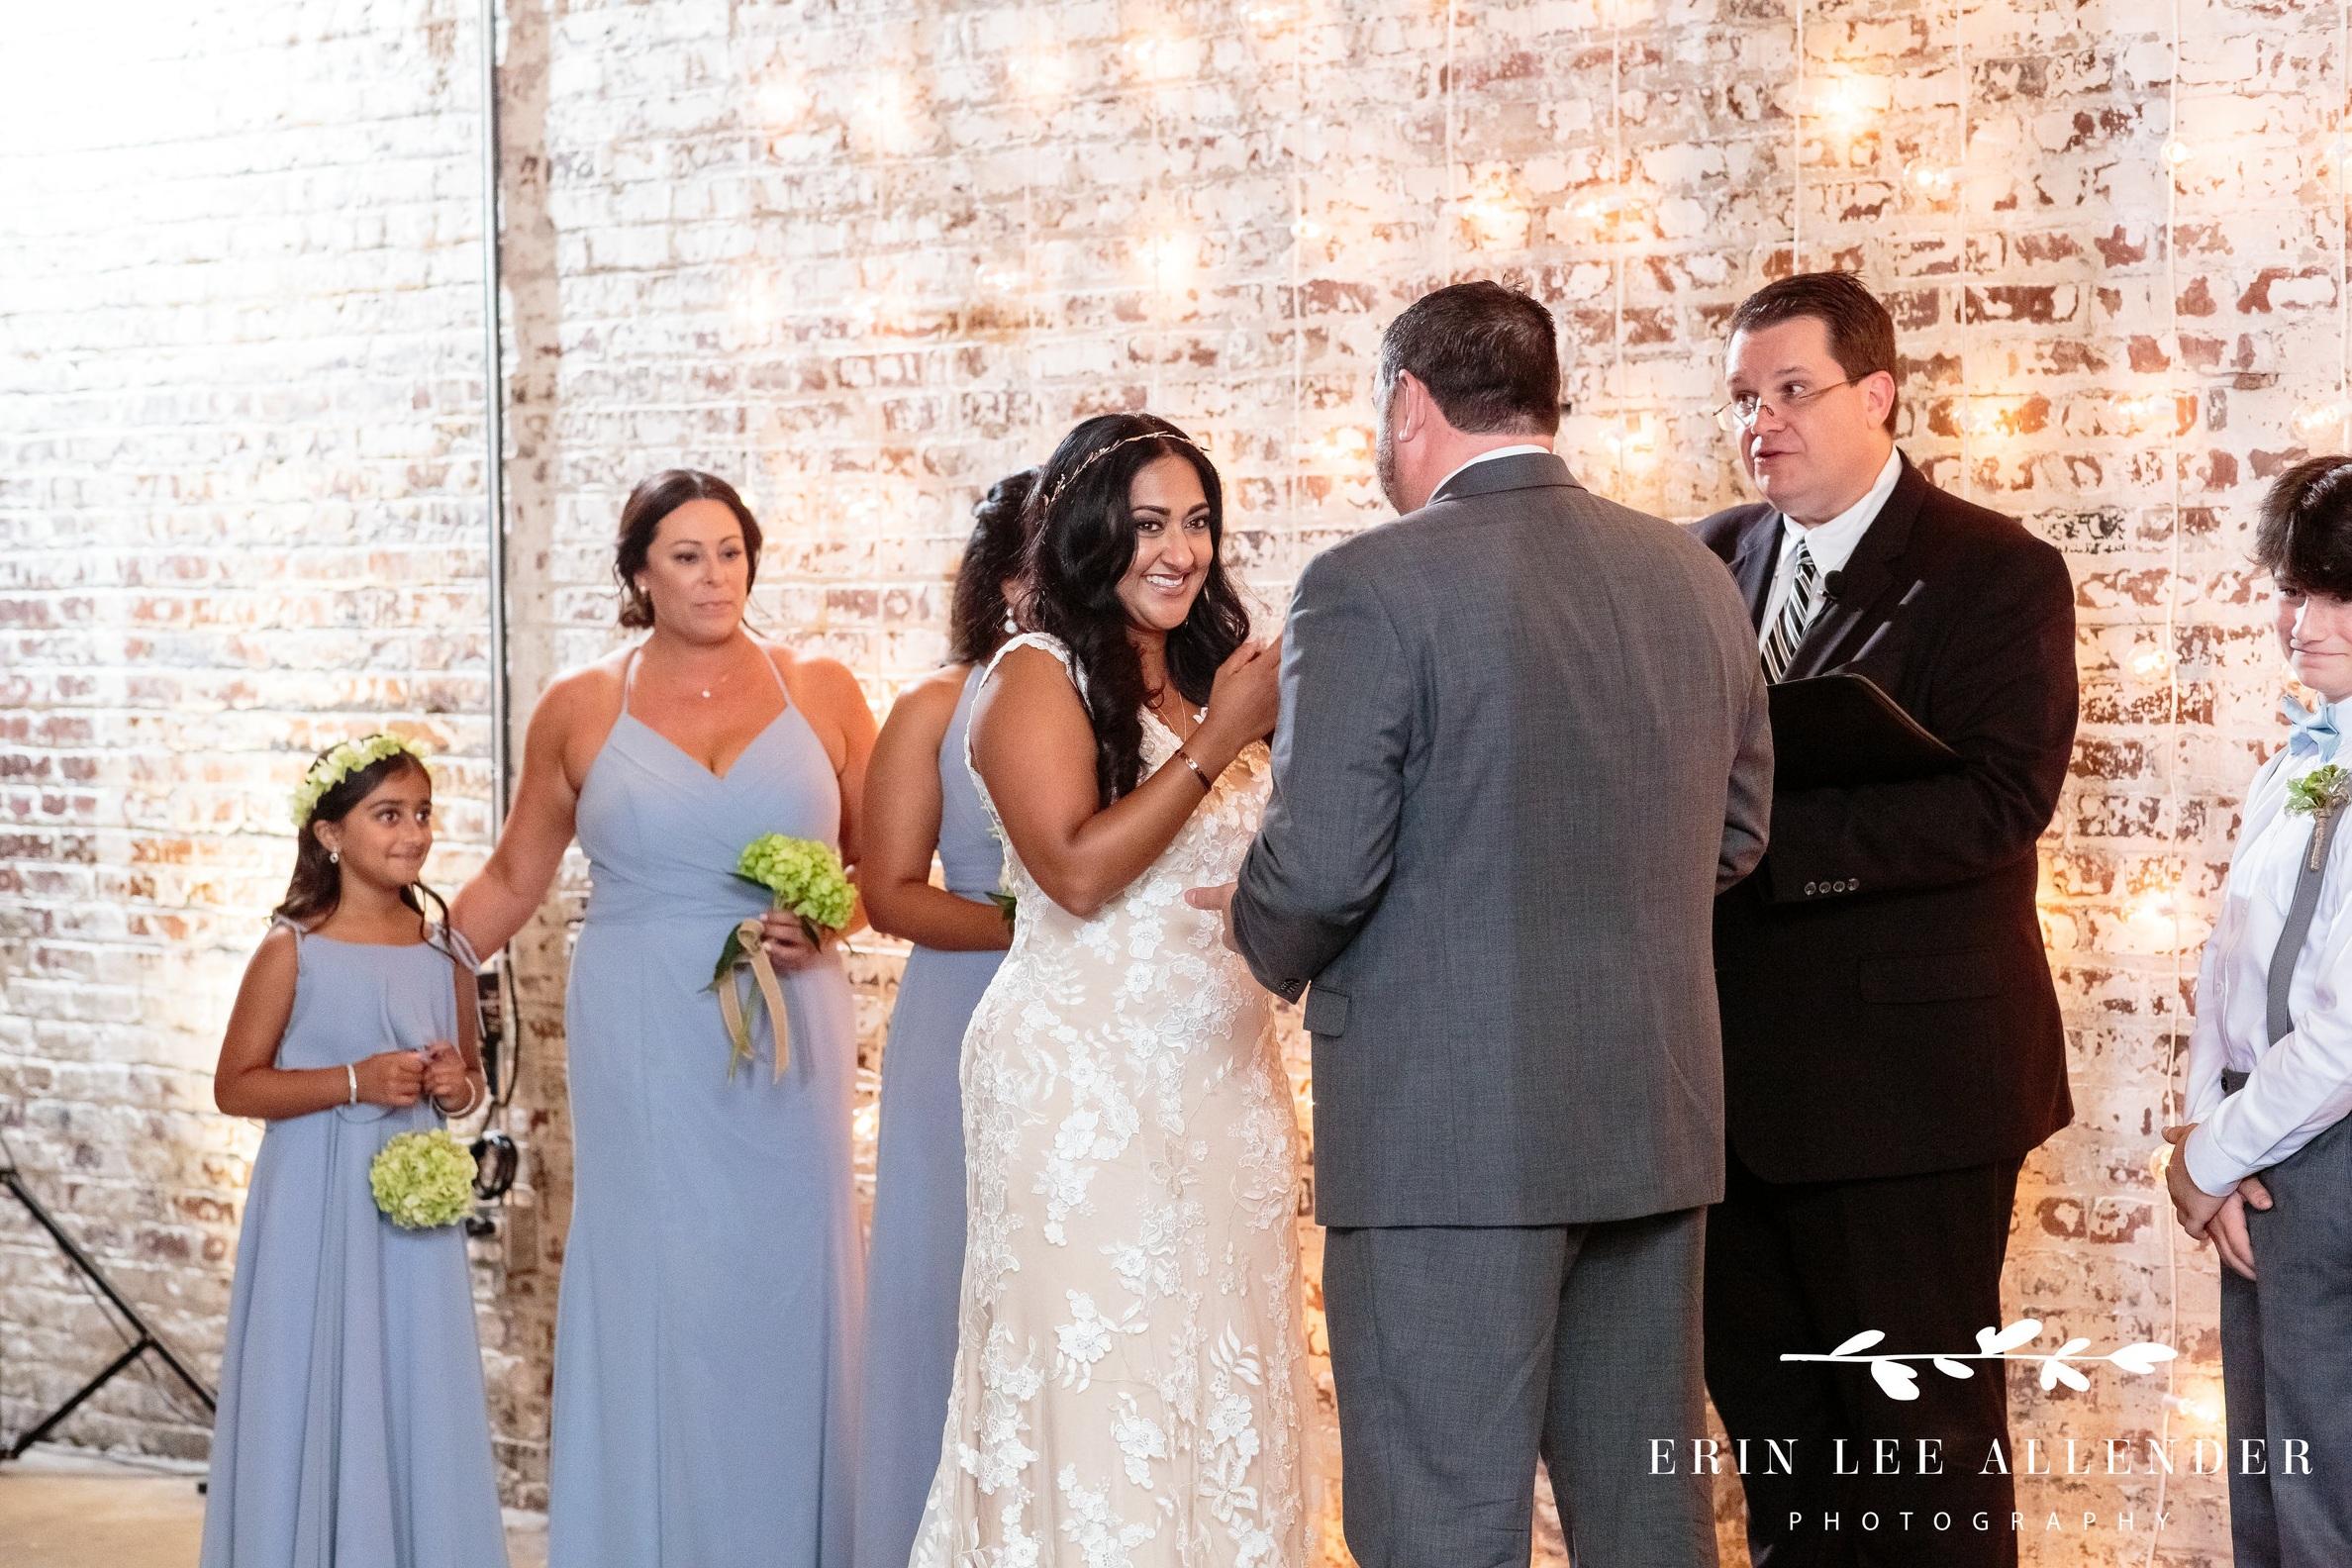 bride-cries-during-ceremony